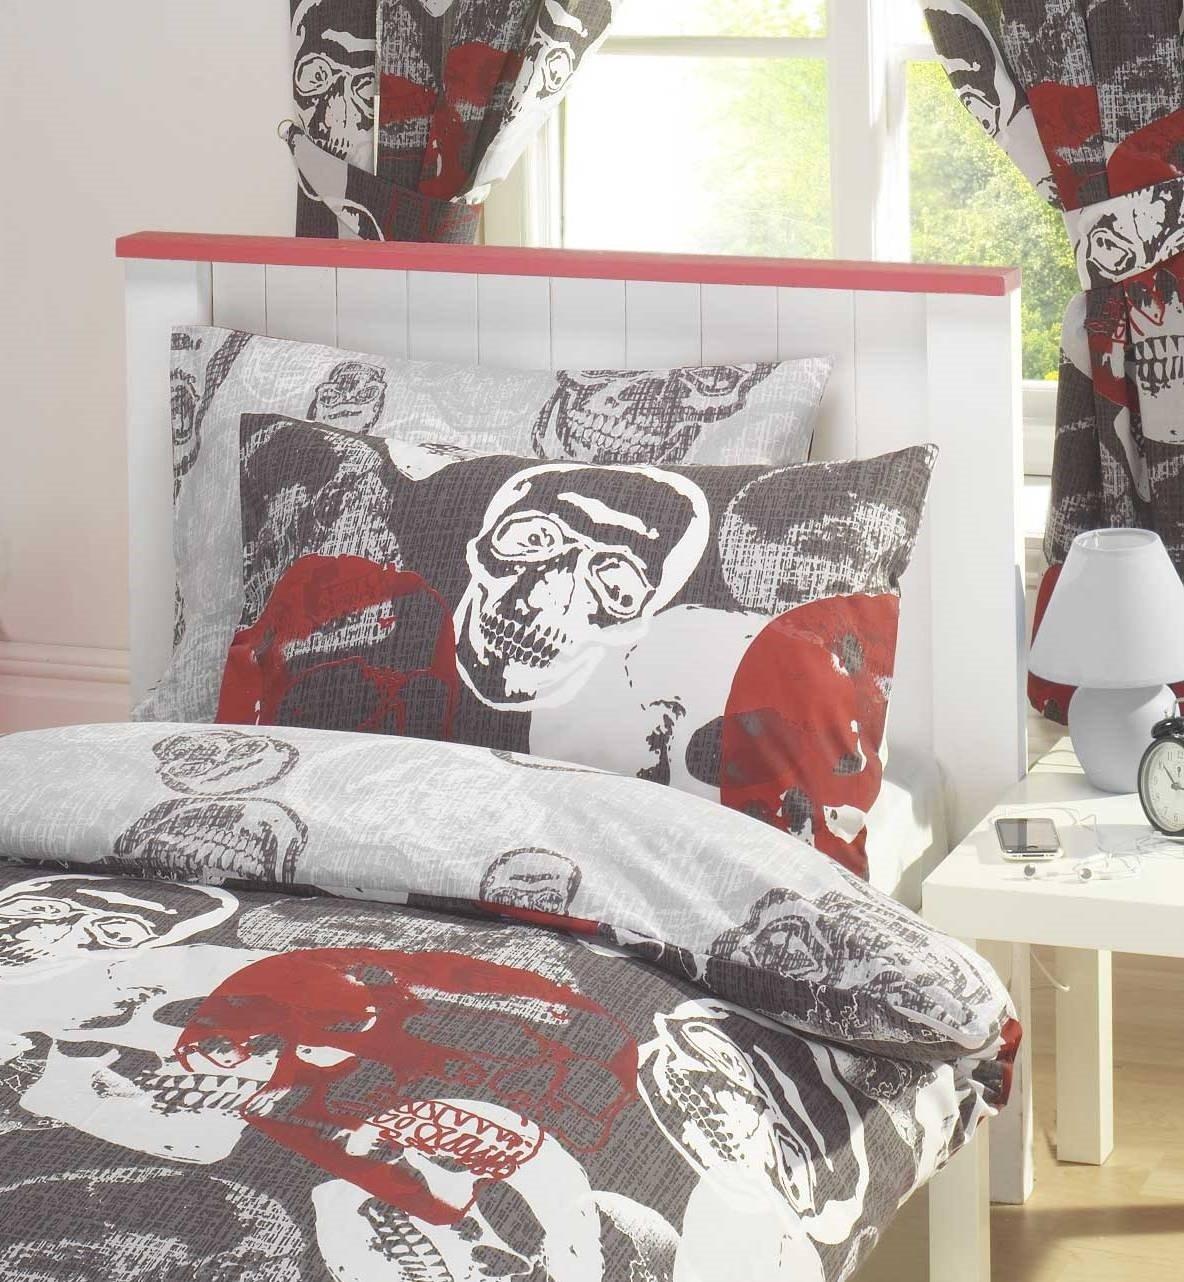 Skull Bedroom Curtains Skulls Luxury Fully Lined Ready Made Bedroom Curtains Set 66 X 72